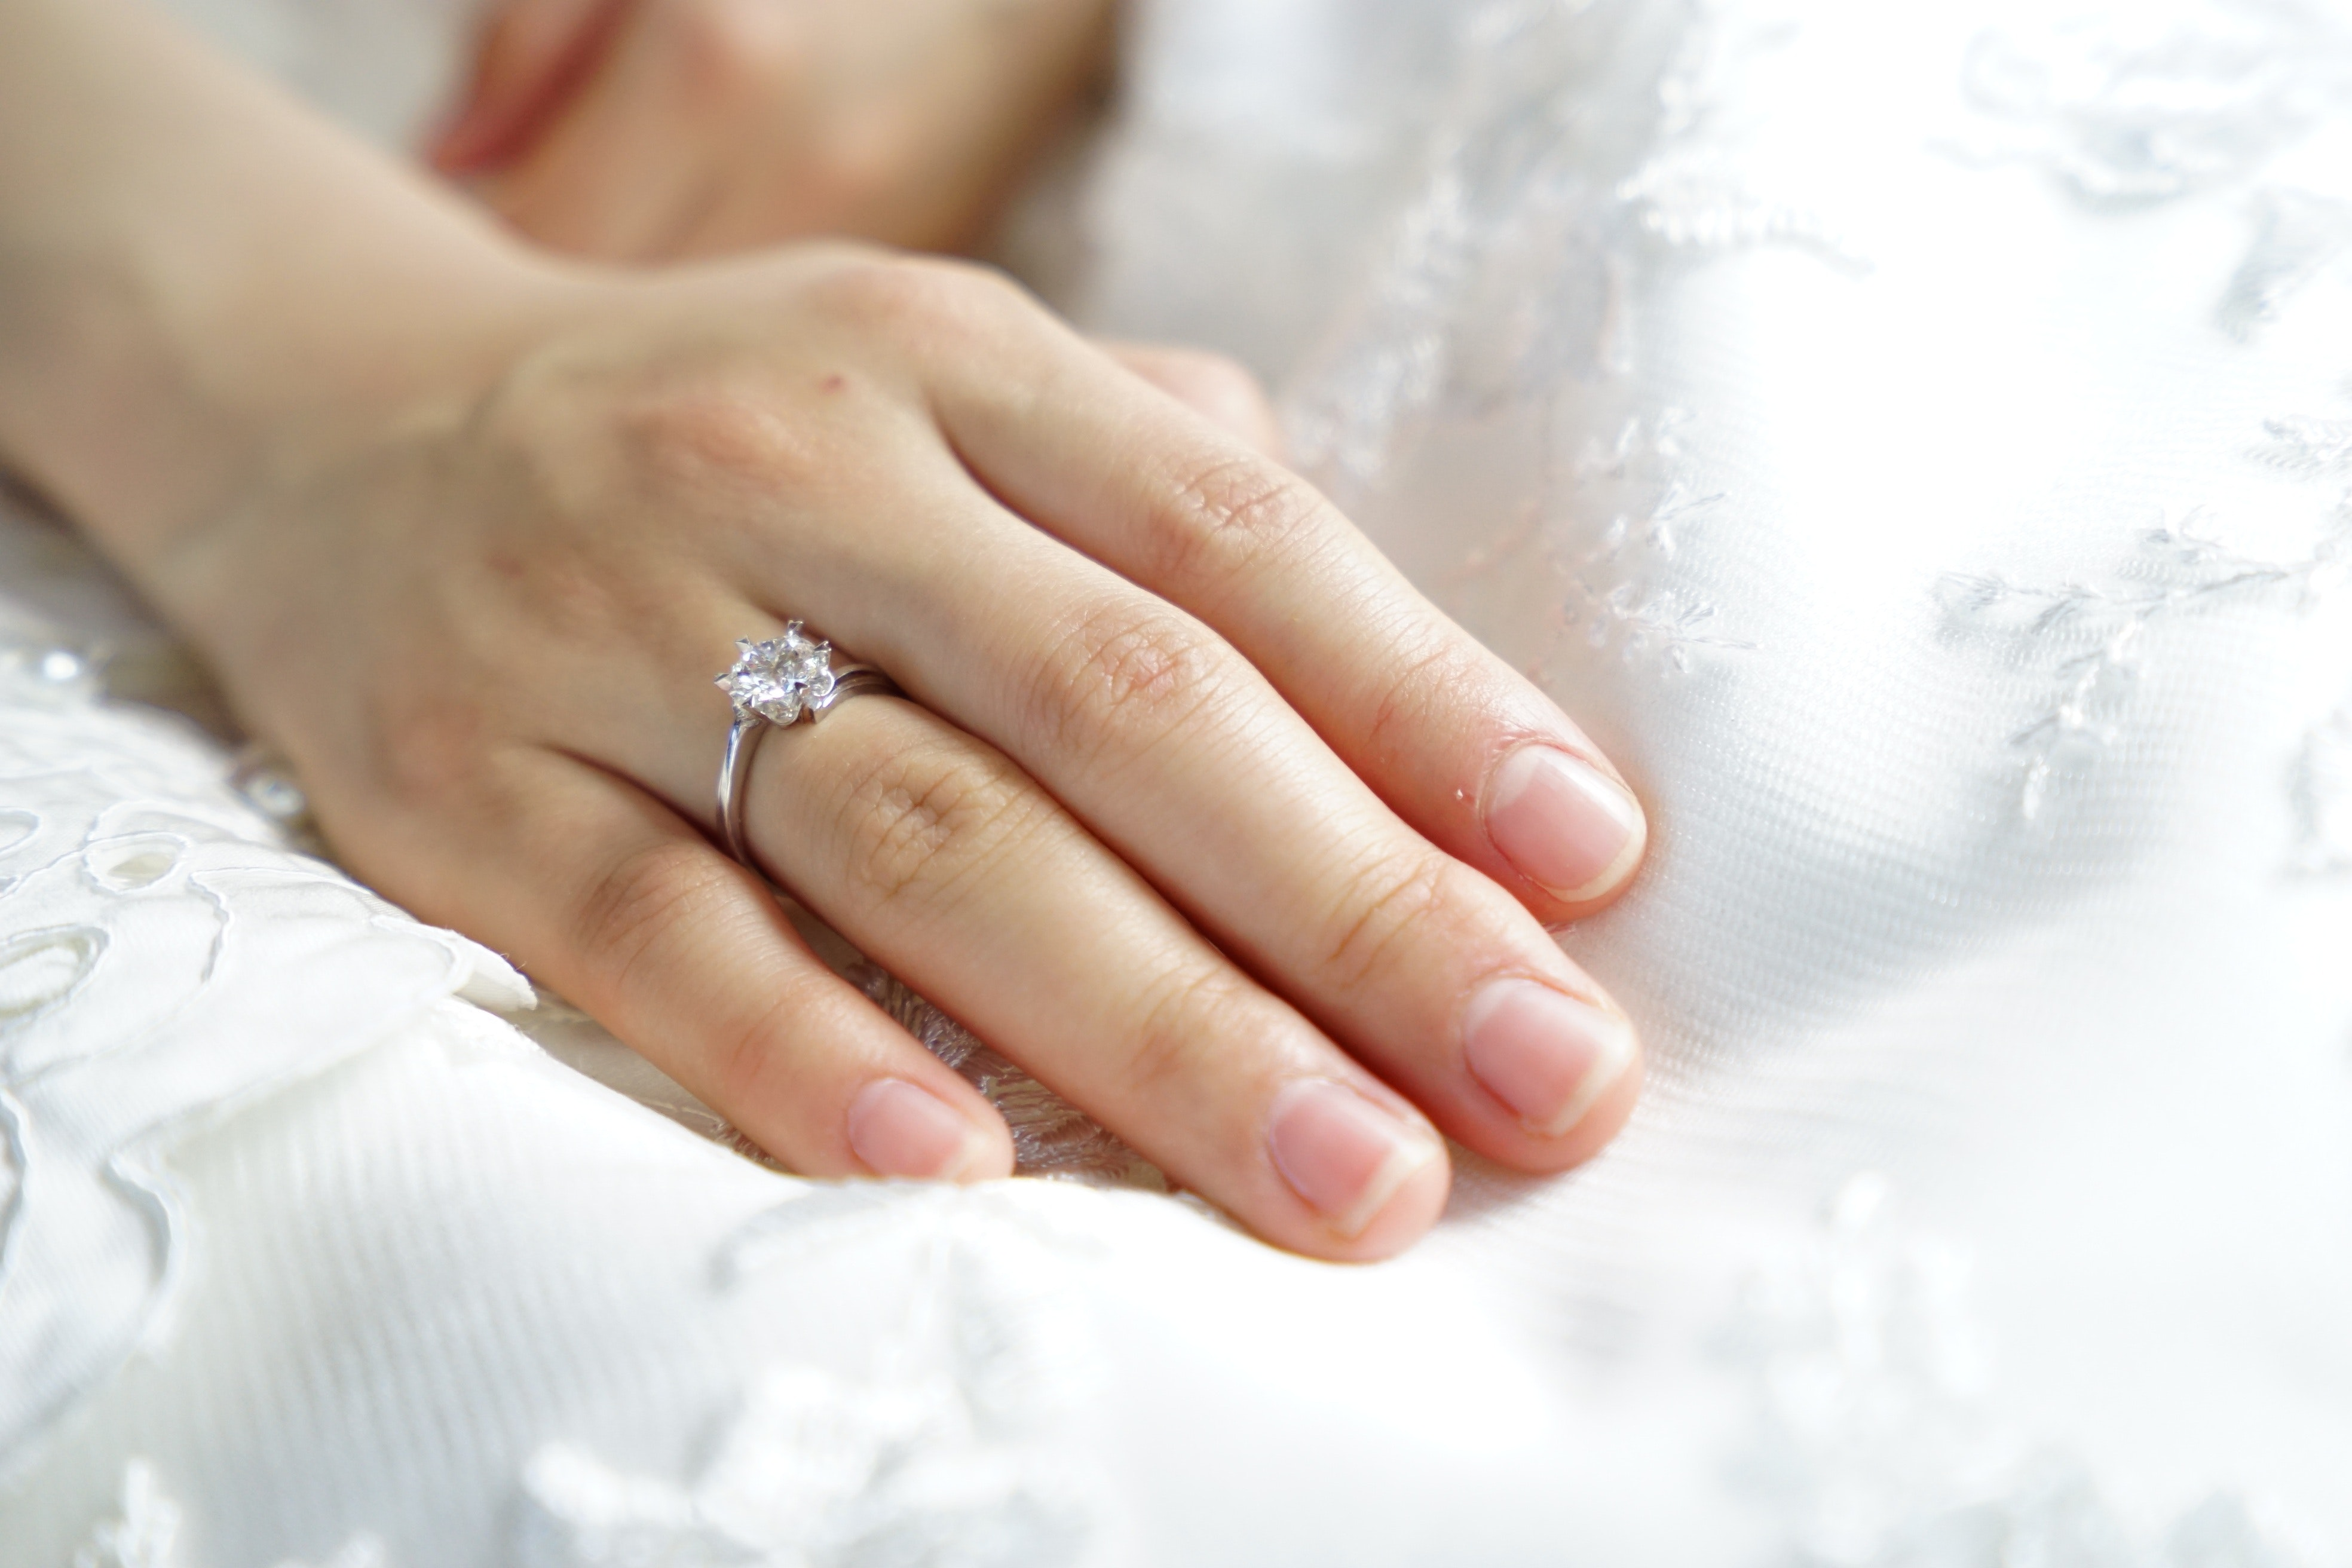 bride-clean-finger-265804 (1)